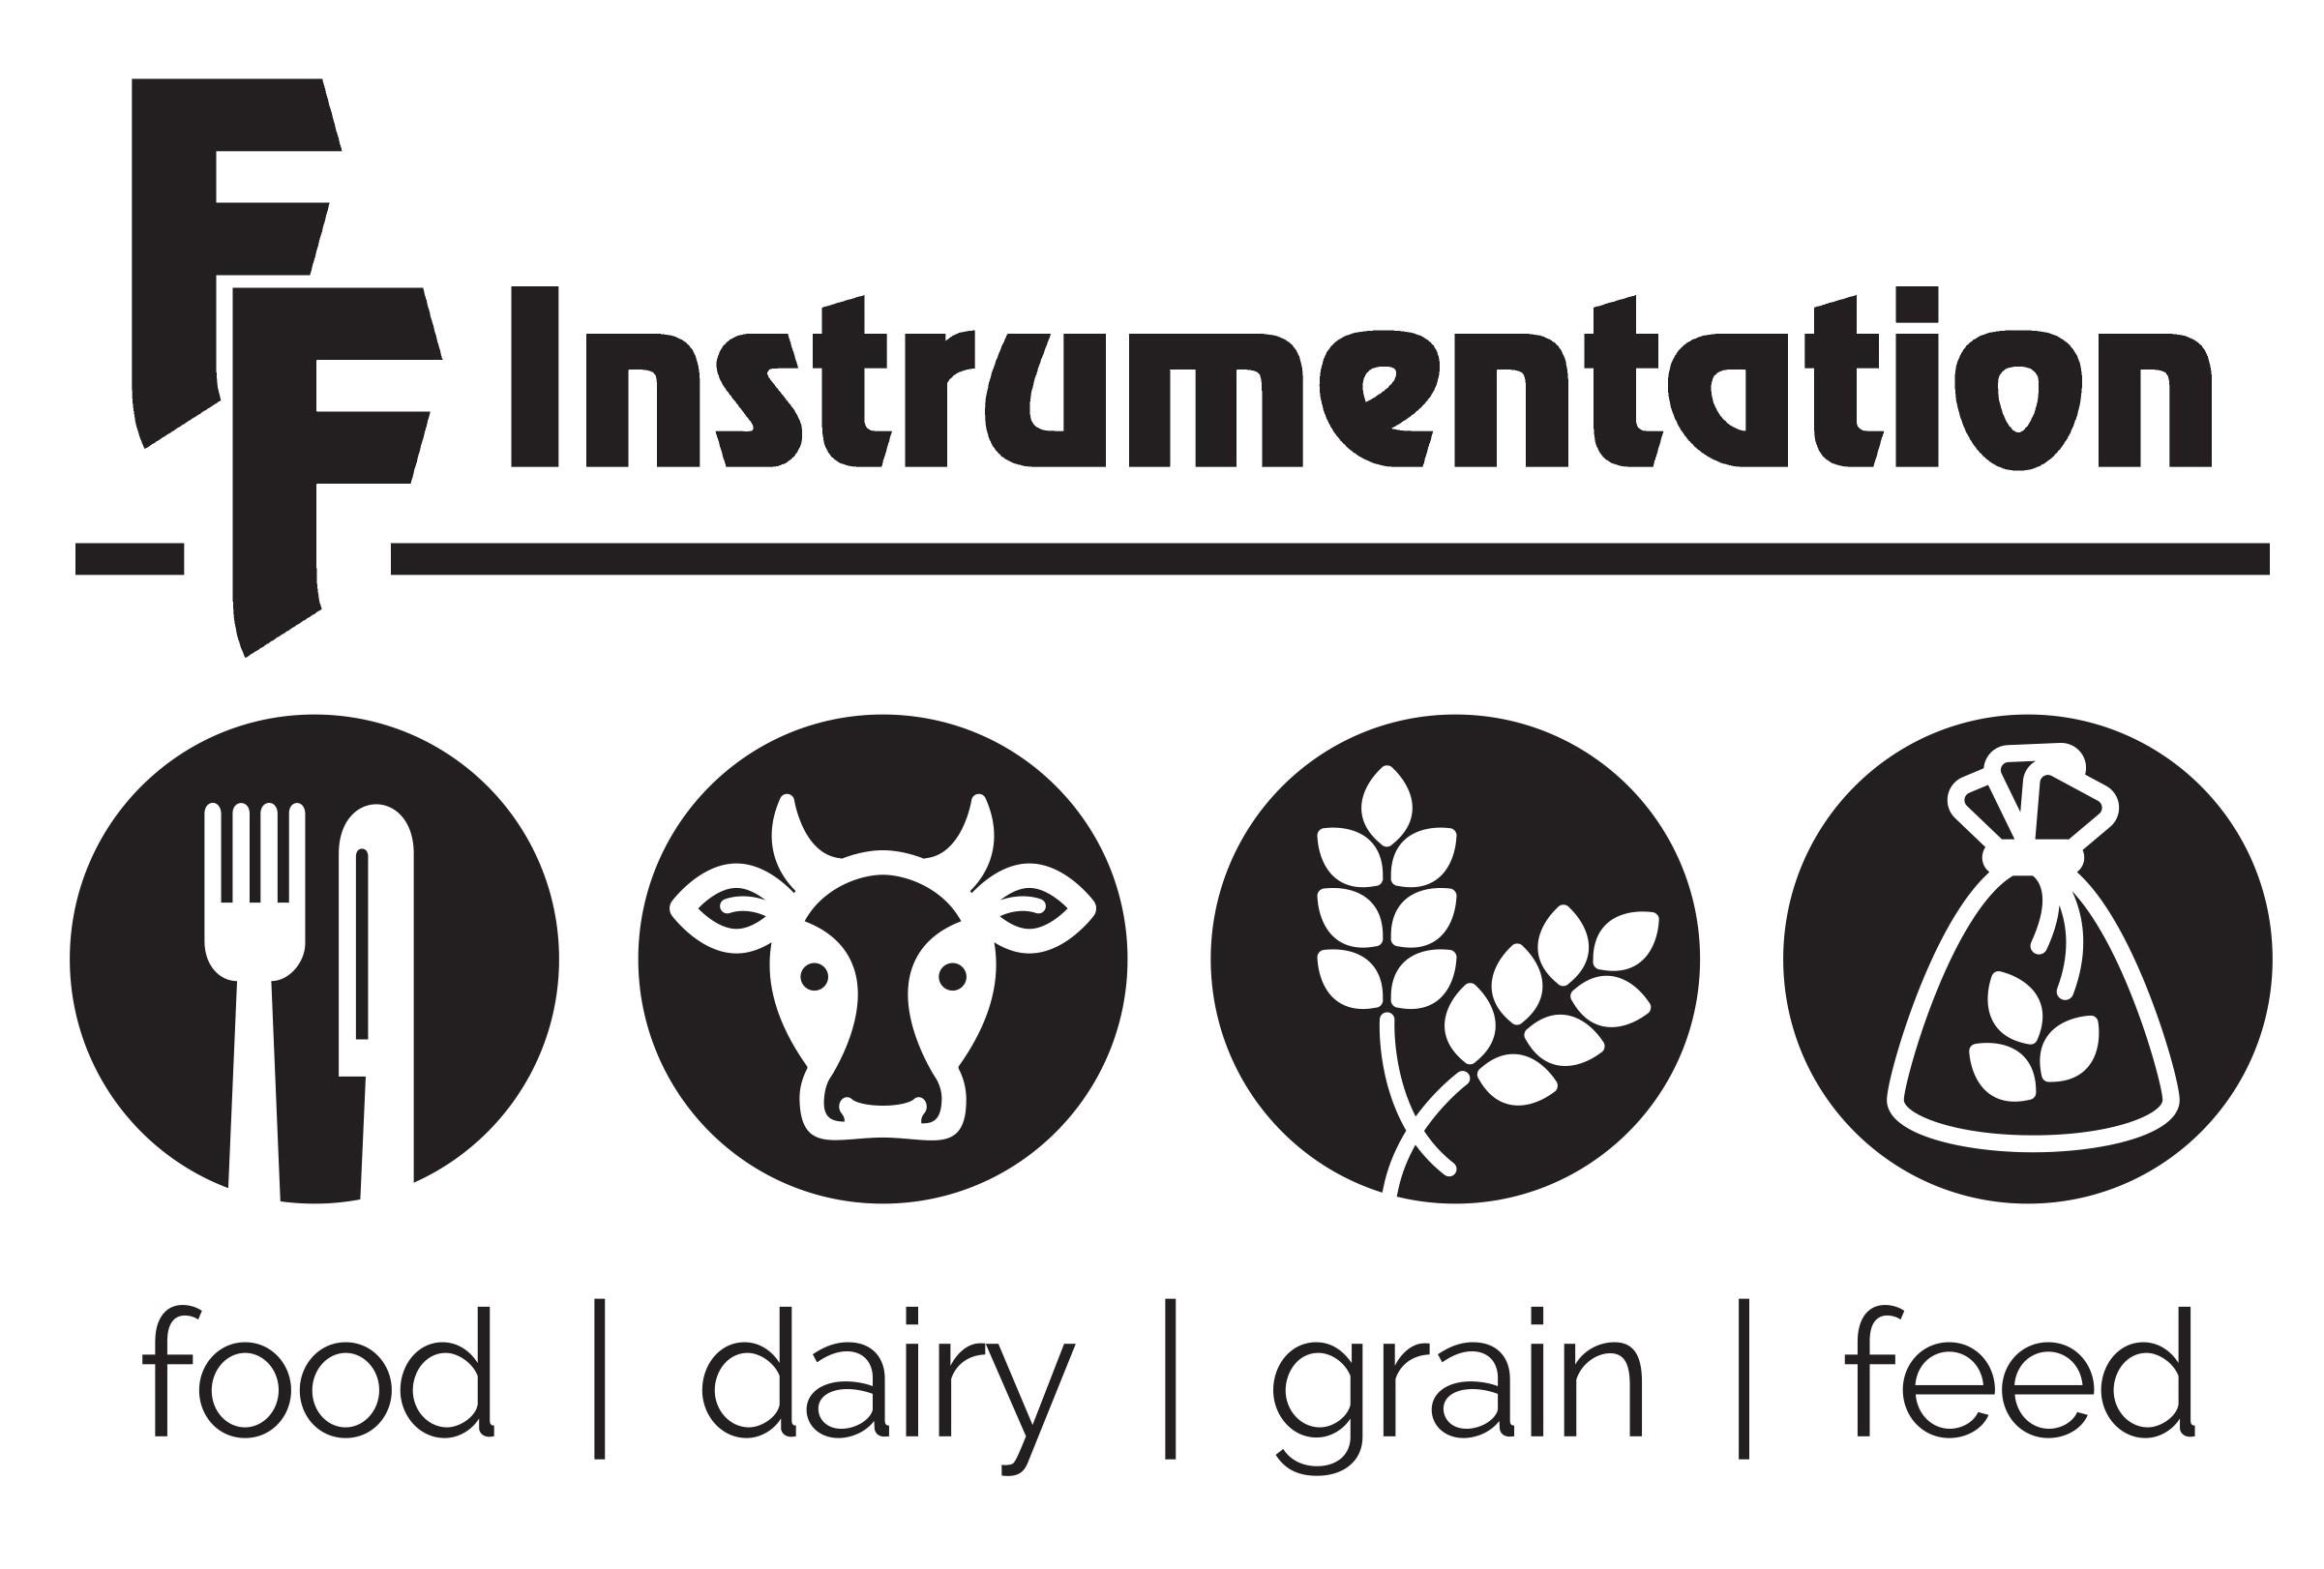 FF Instrumentation